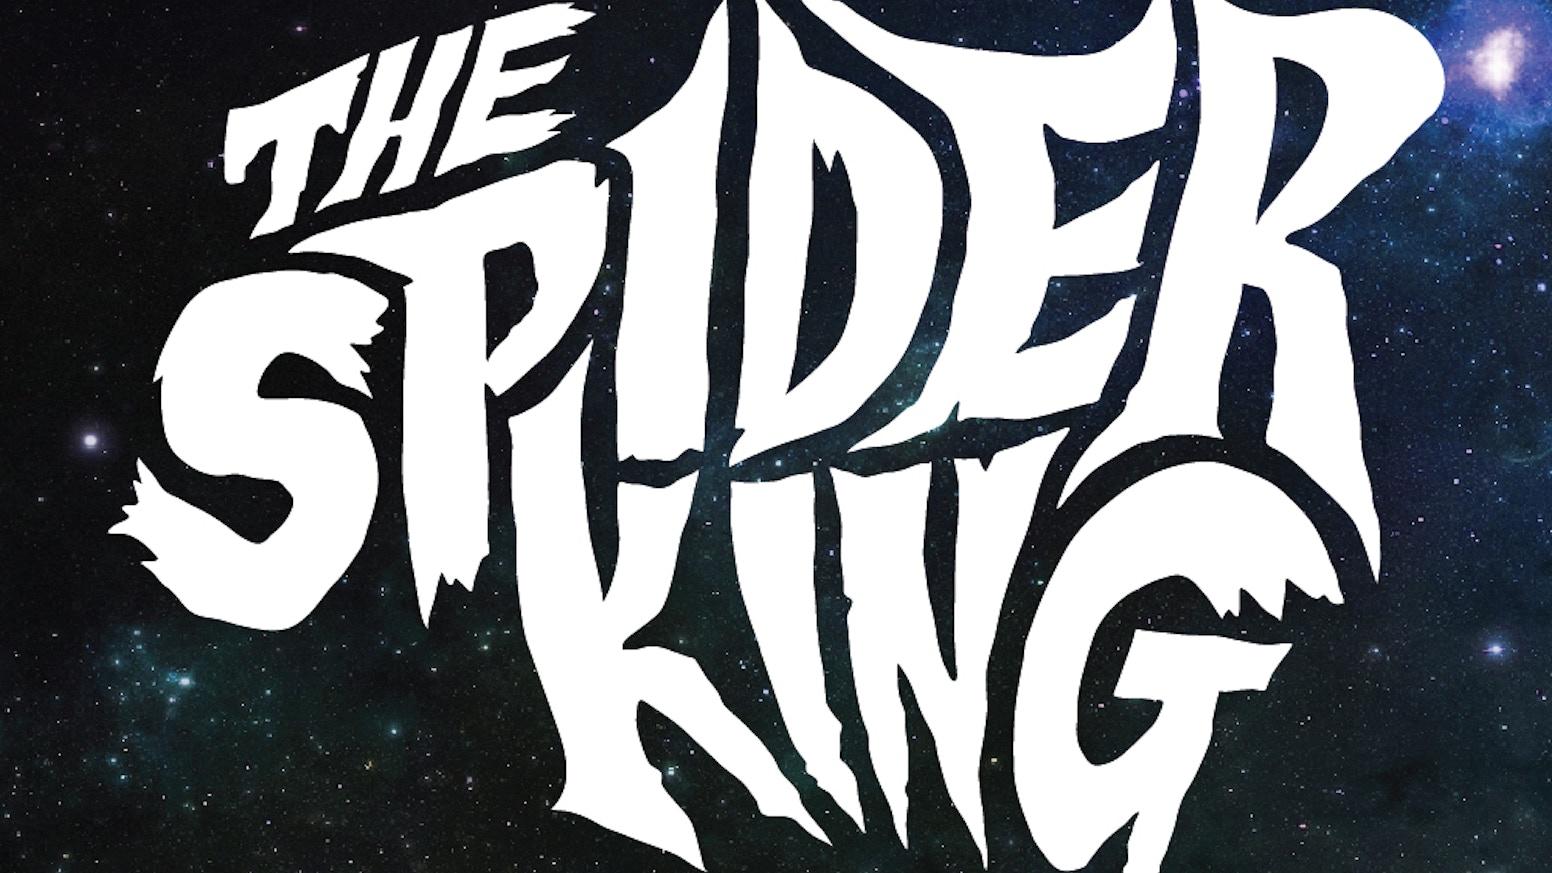 The Spider King - Graphic Novel by Josh Vann — Kickstarter